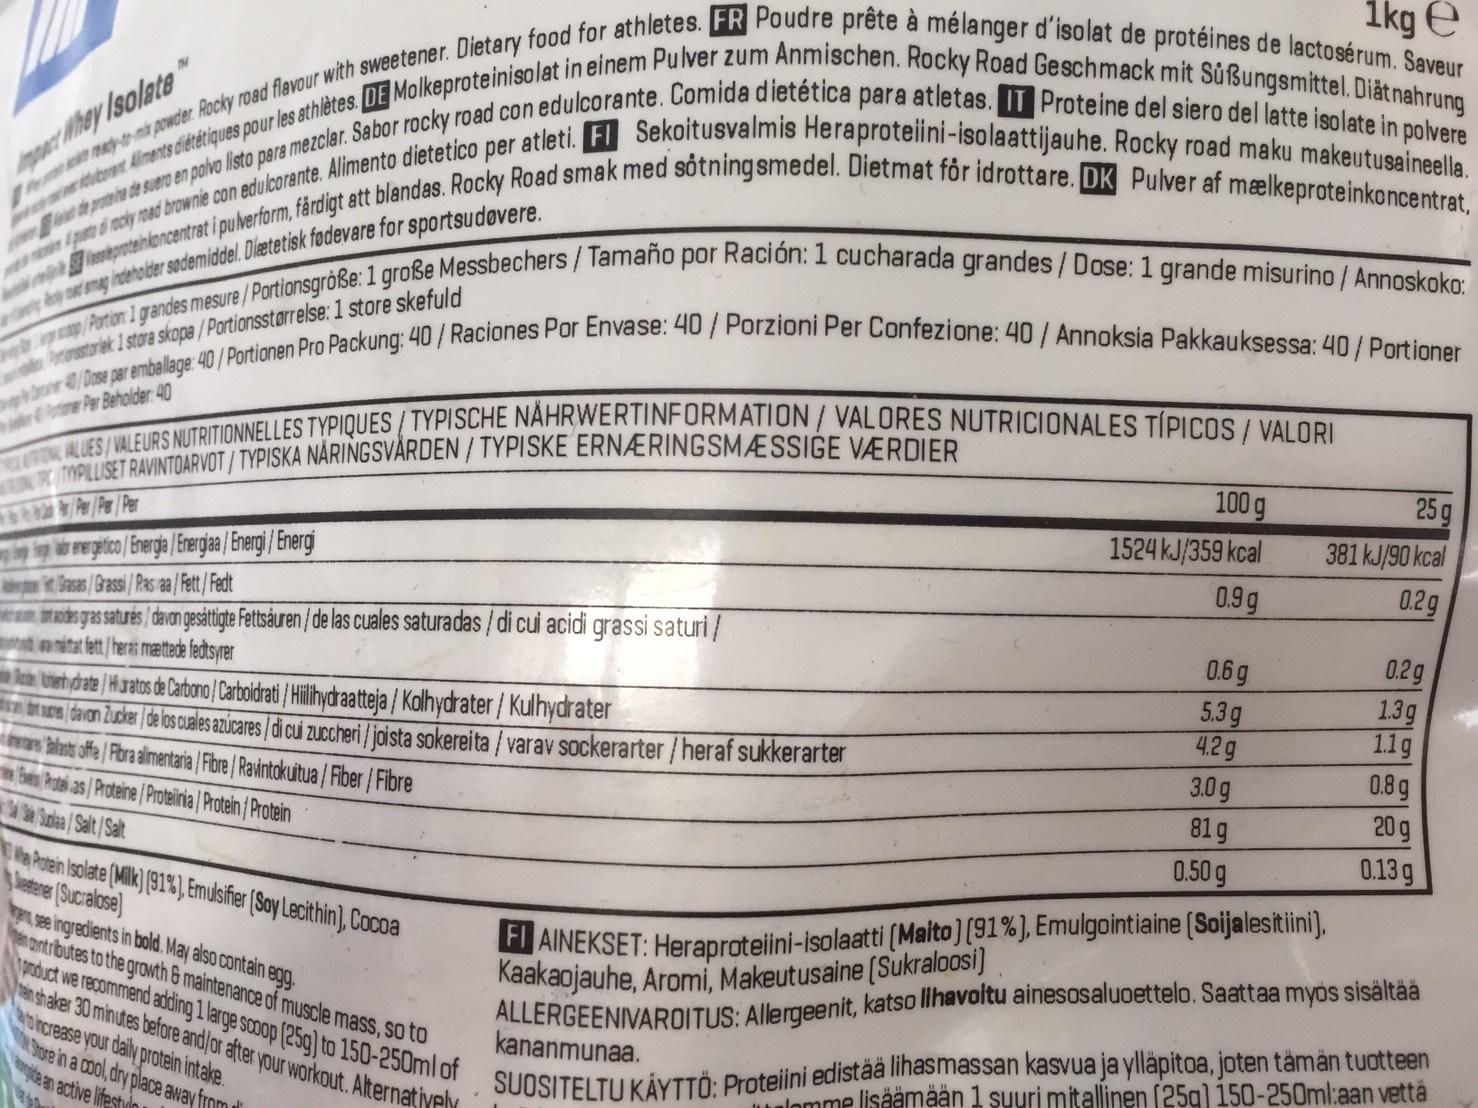 【WPI】IMPACT 分離ホエイプロテイン (アイソレート)「ROCKY ROAD FLAVOUR(ロッキーロード味)」の成分表の確認